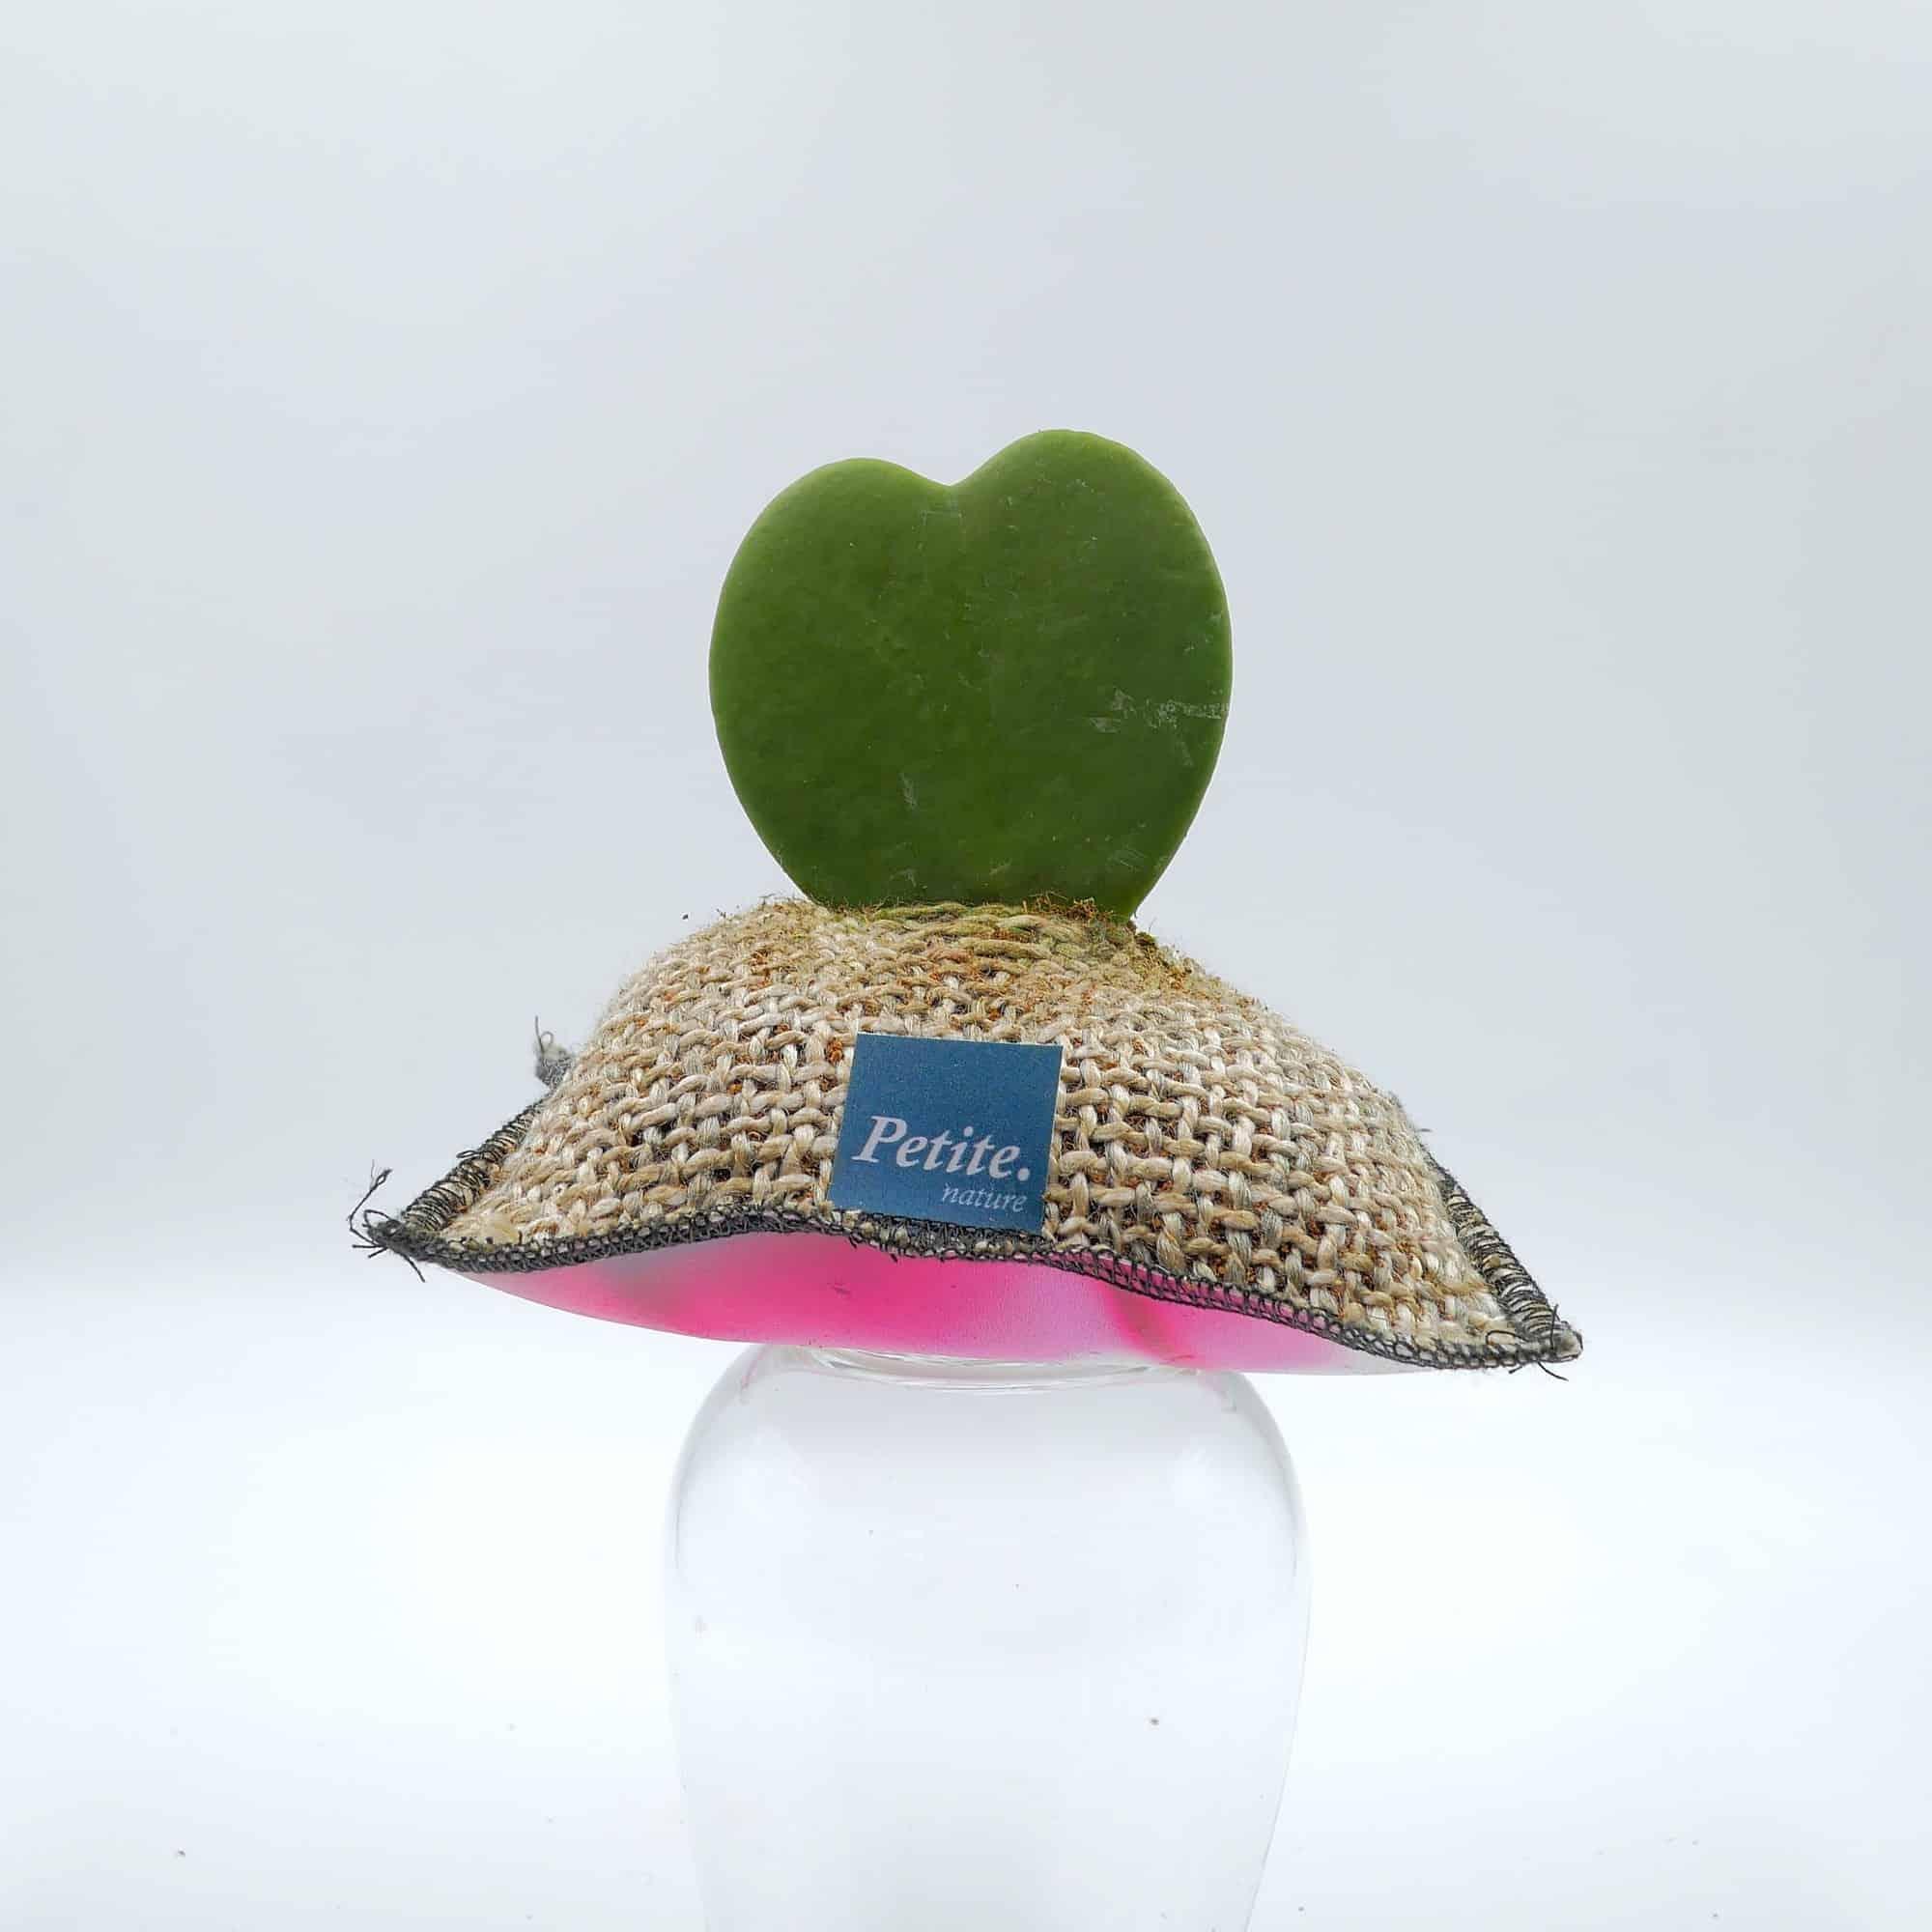 Petite nature plantée cactus